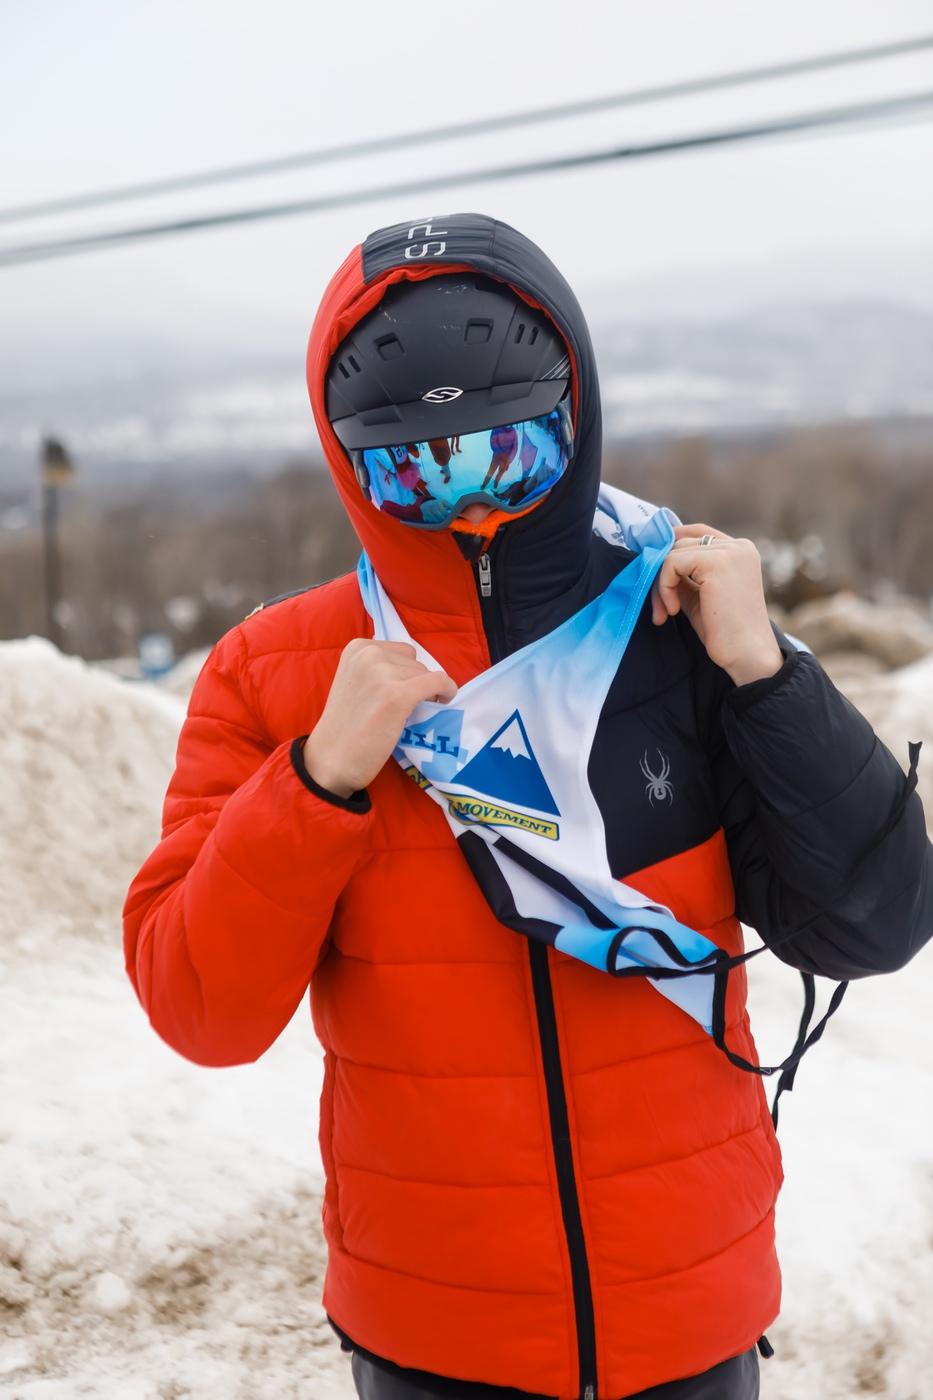 WinterKids Downhill 24 2021 SDP 2589